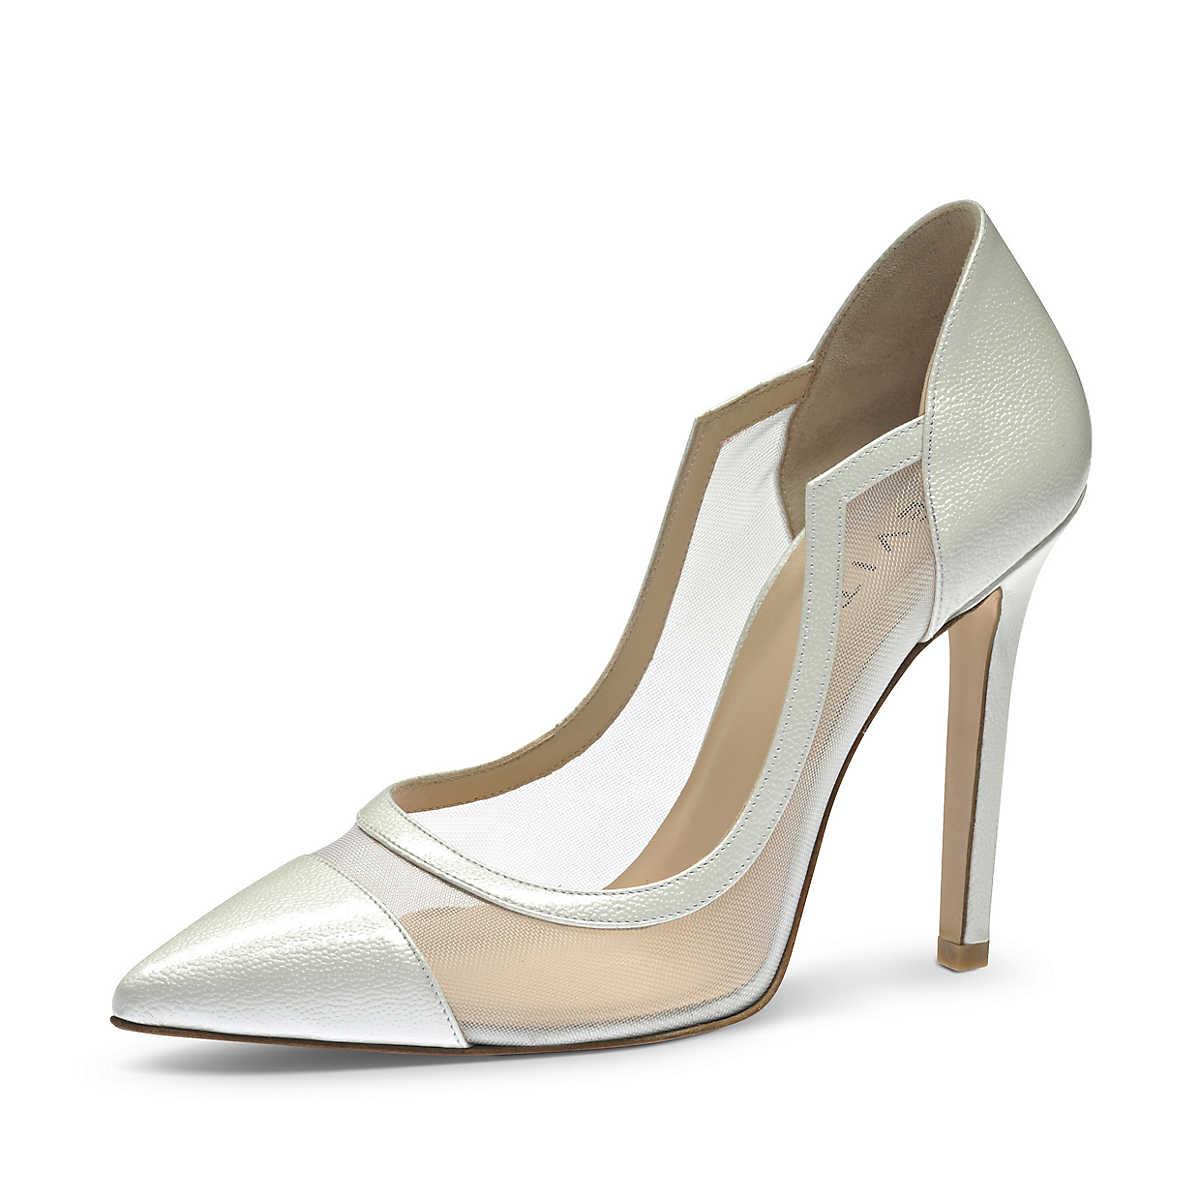 Evita Shoes Pumps weiÃ?Â? - Evita Shoes - Pumps - Schuhe - mirapodo.de